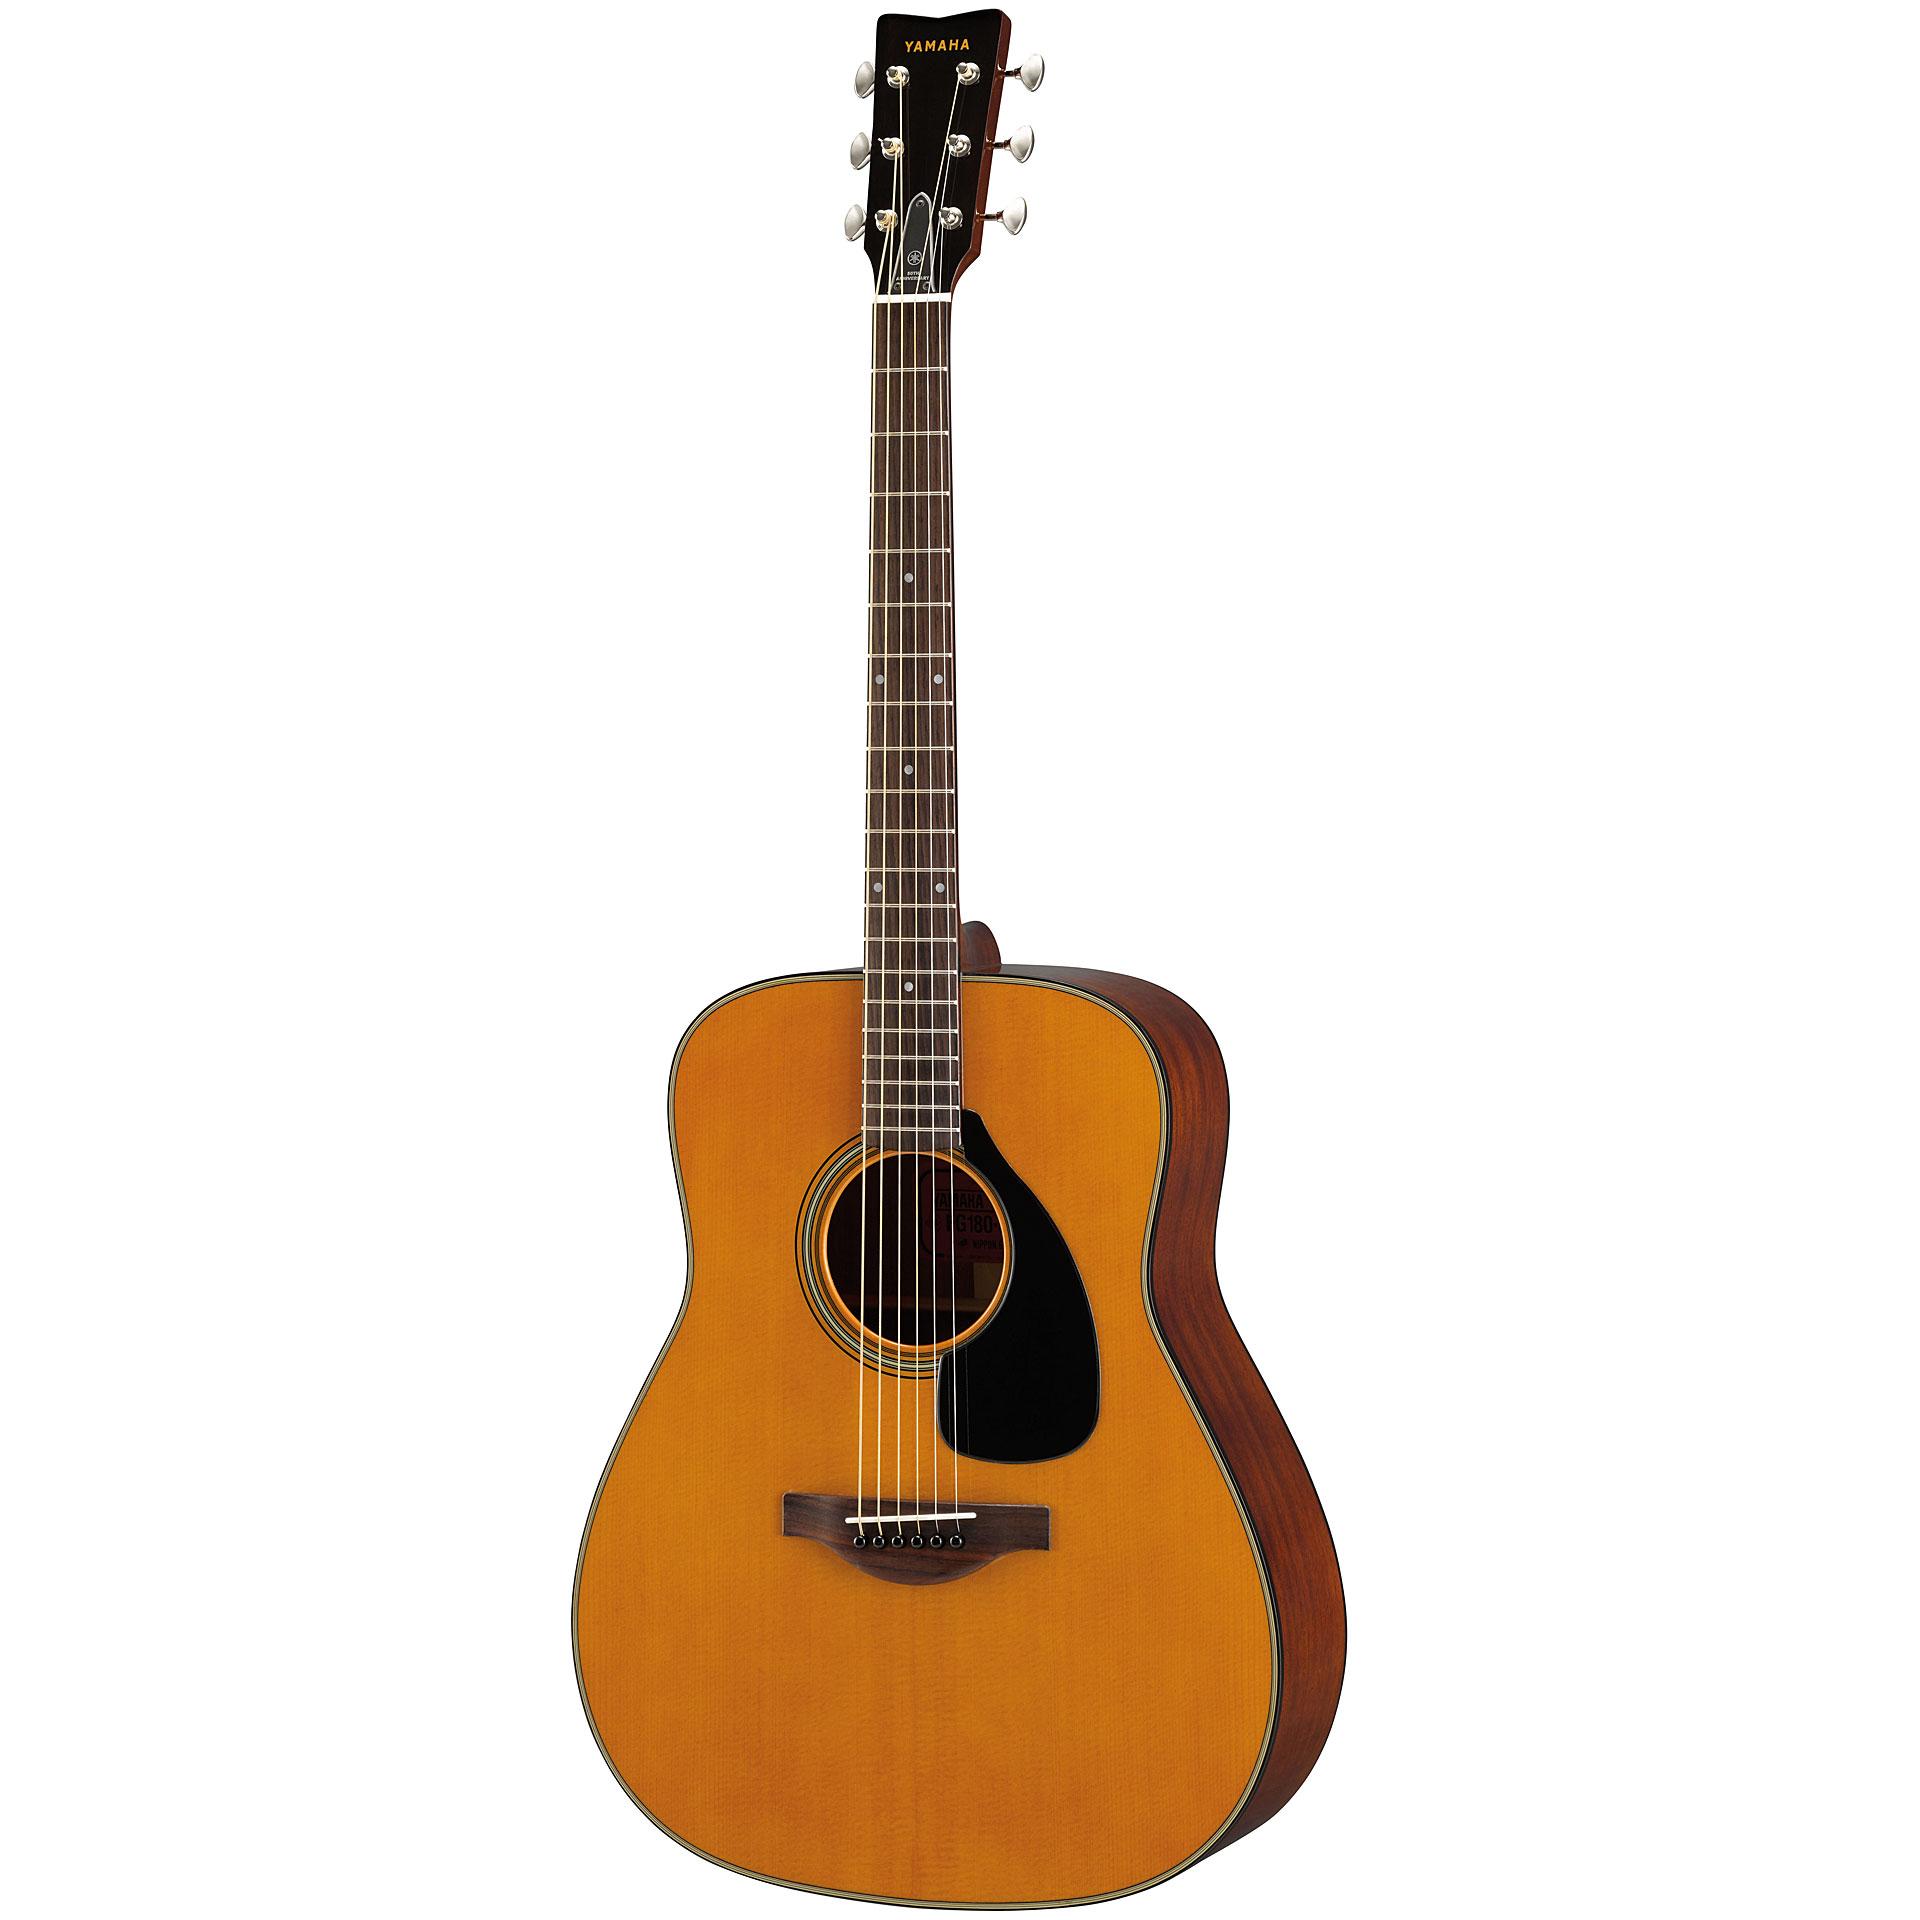 yamaha fg180 50th guitare acoustique. Black Bedroom Furniture Sets. Home Design Ideas